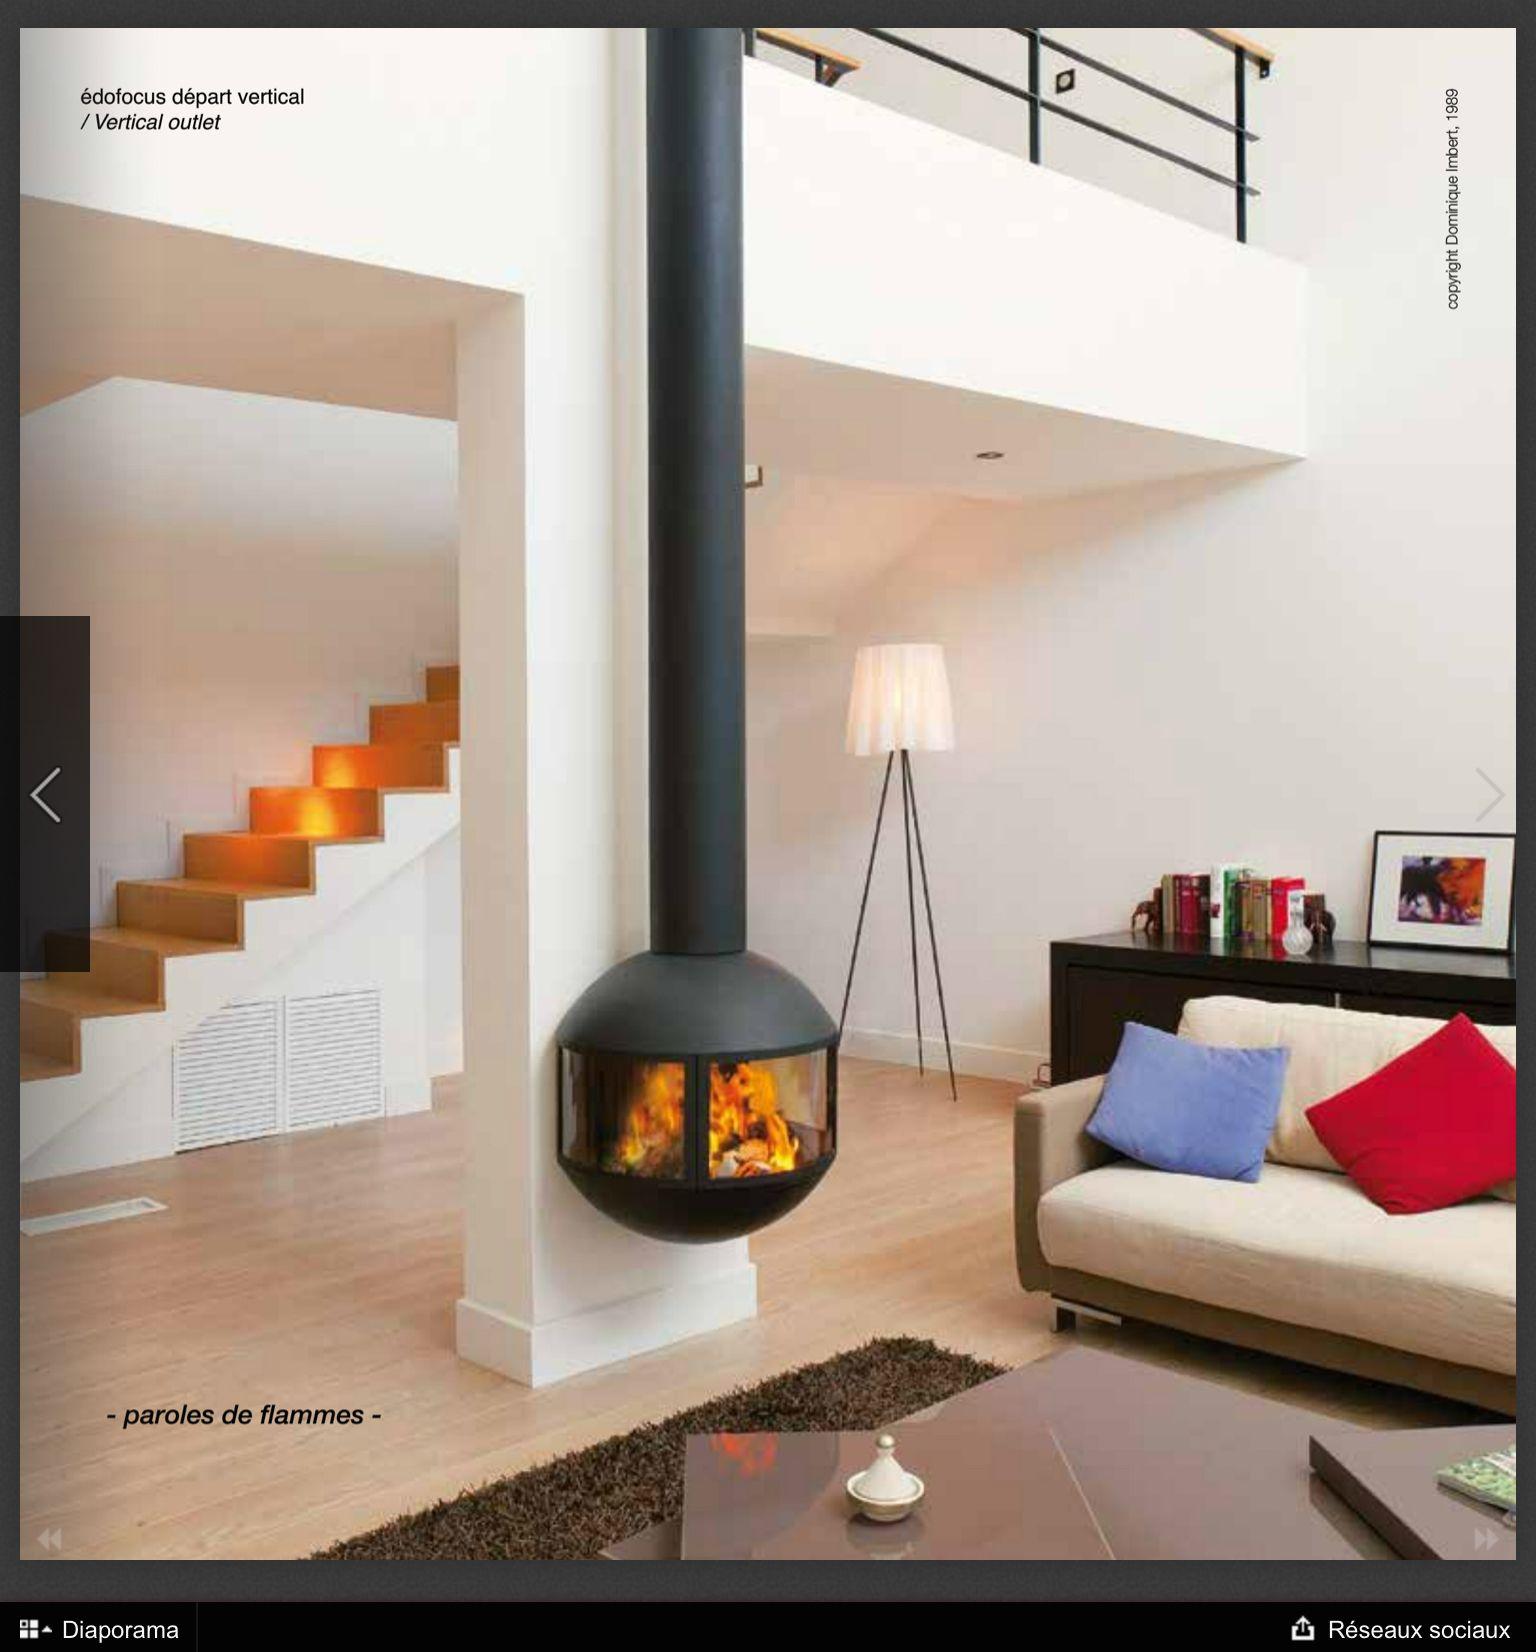 Epingle Par Cathie Herrmann Sur Cheminee Poele Cheminee Design